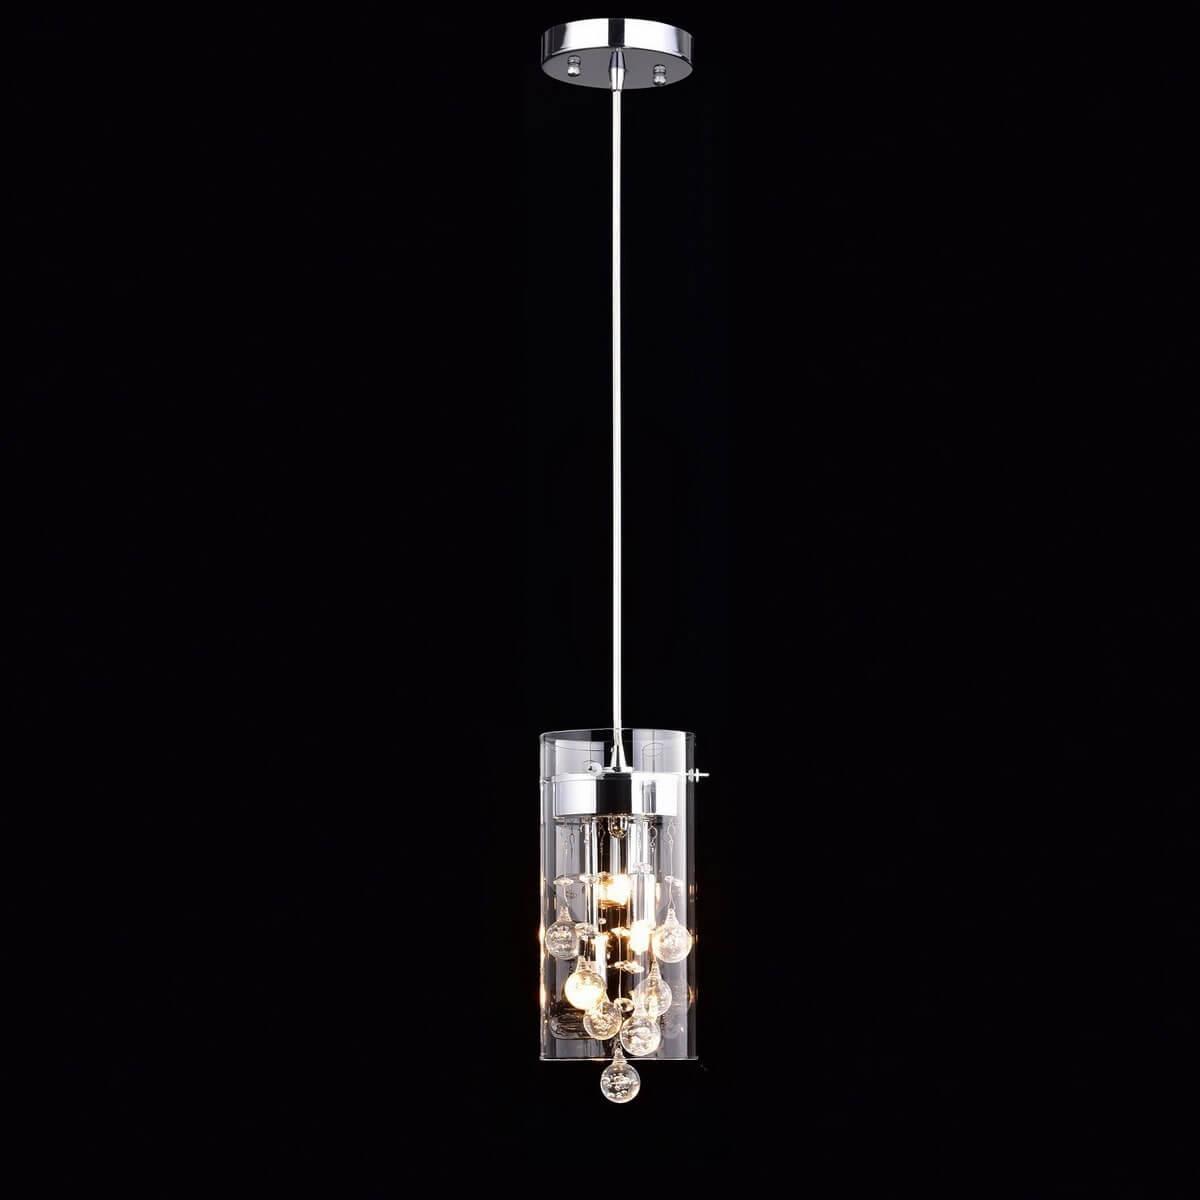 Modern Crystal Pendant Light mini Glass Cylinder Fixture